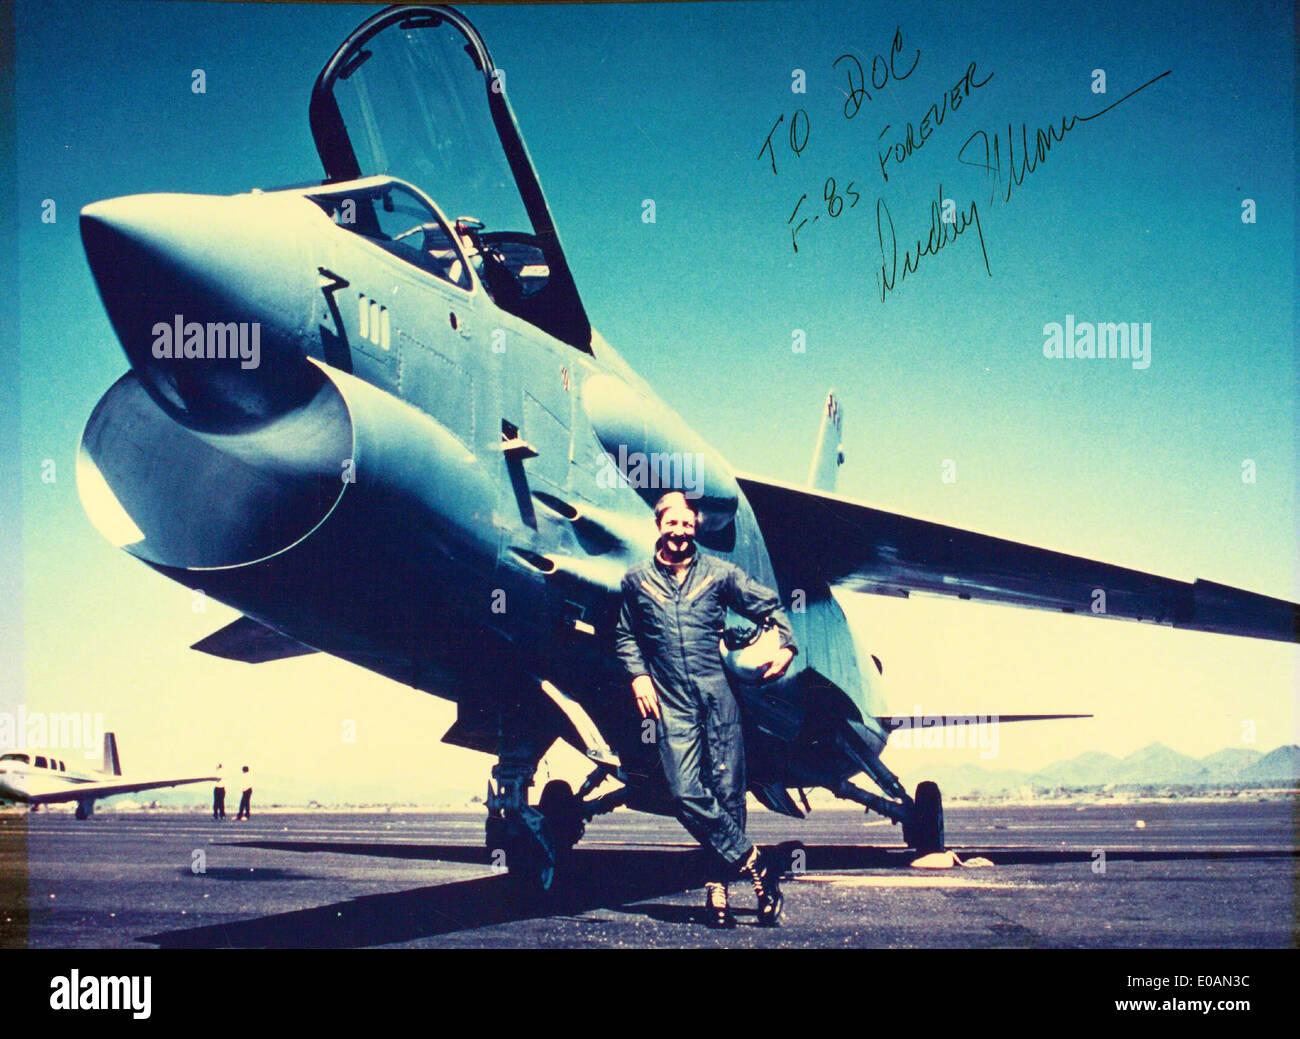 In Flight Photograph Of John Glenn Piloting His F8u 1p Crusader During The